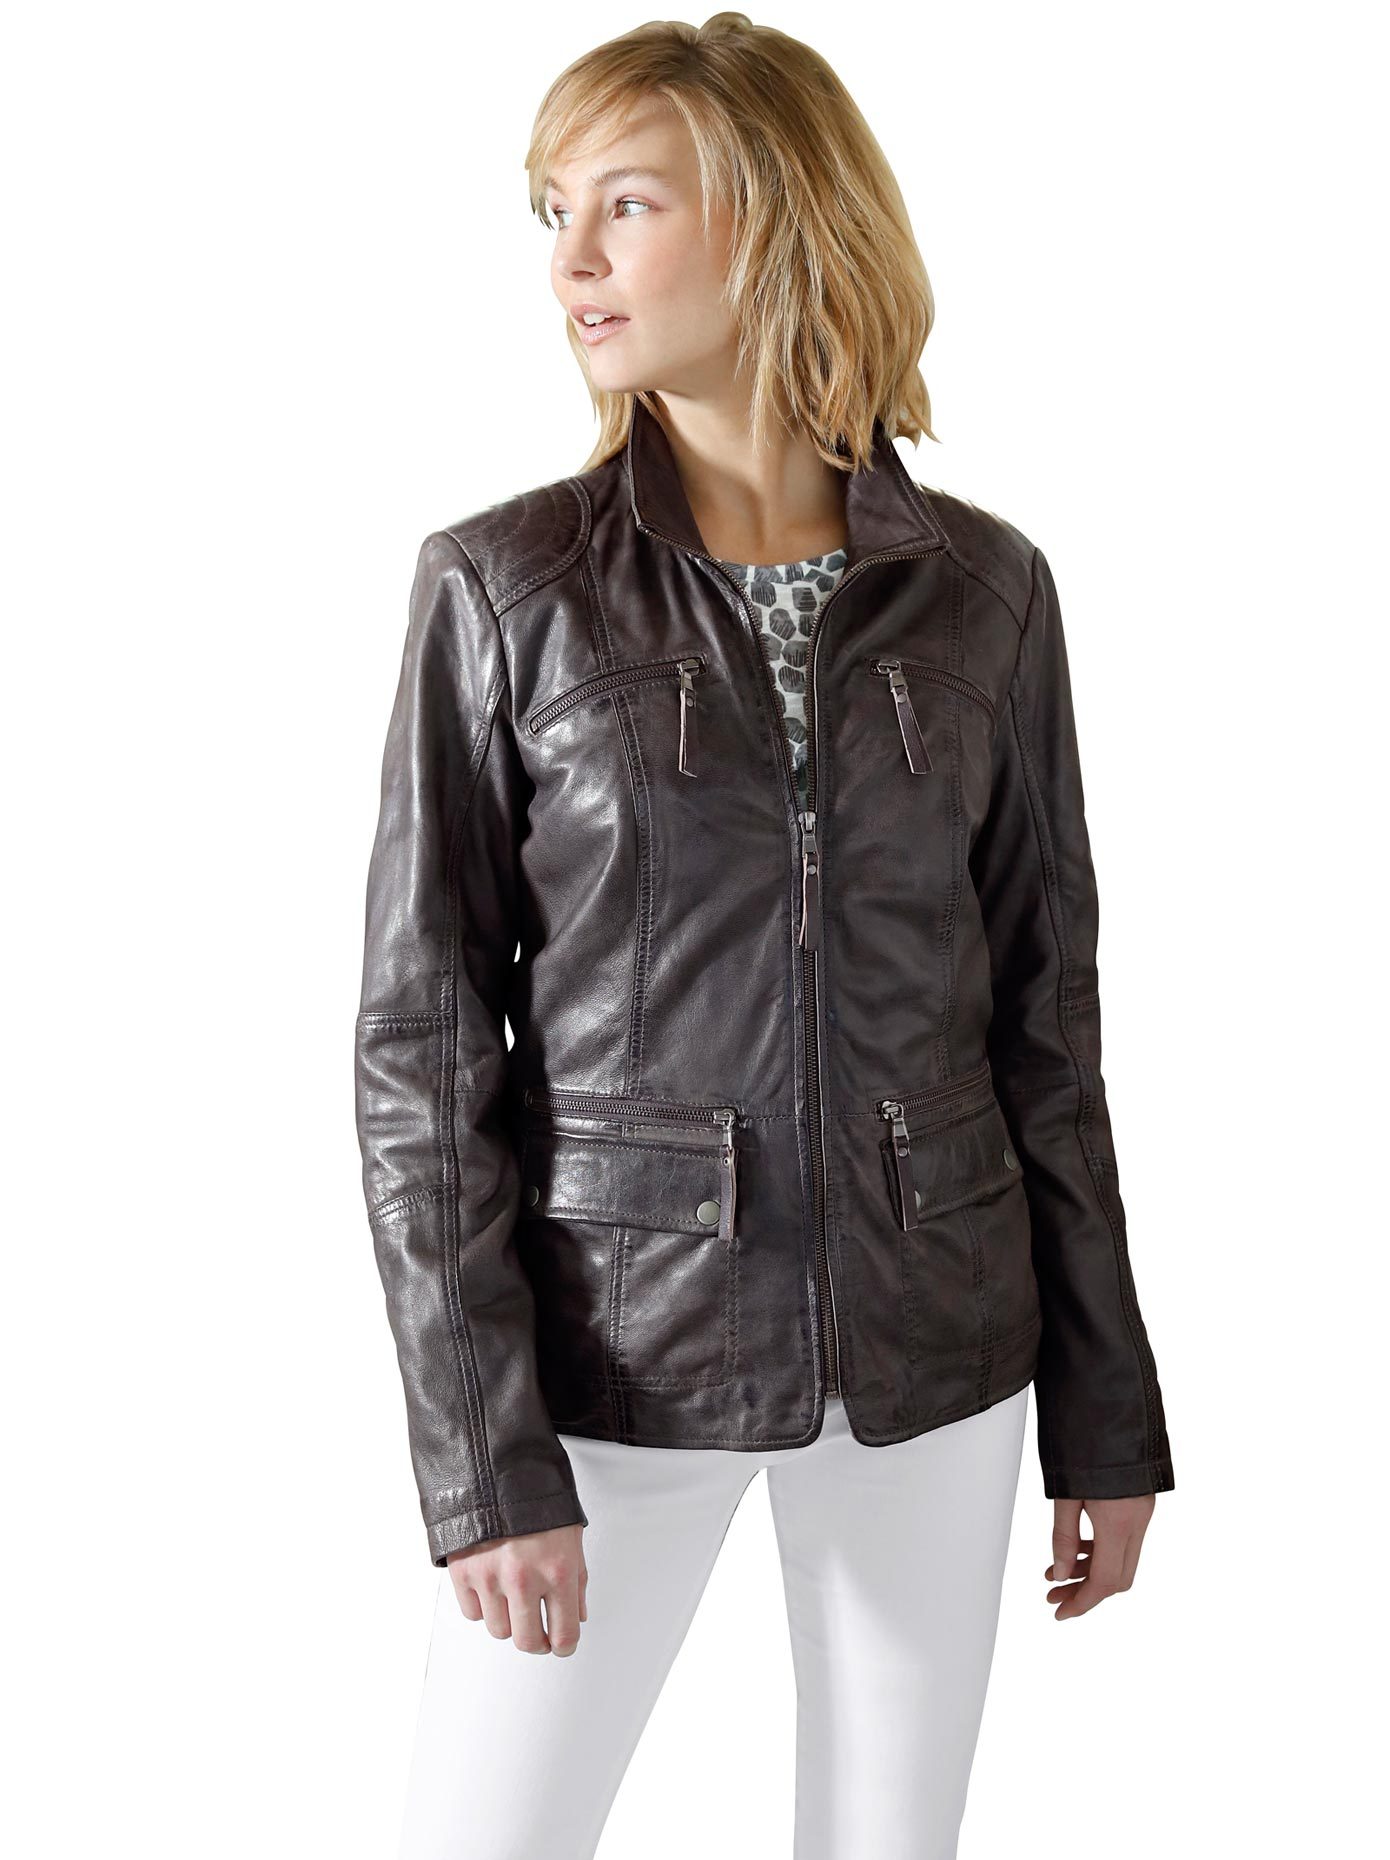 Classic Inspirationen Leder-Jacke aus handschuhweichem Leder   Accessoires   Grau   Leder   Classic Inspirationen